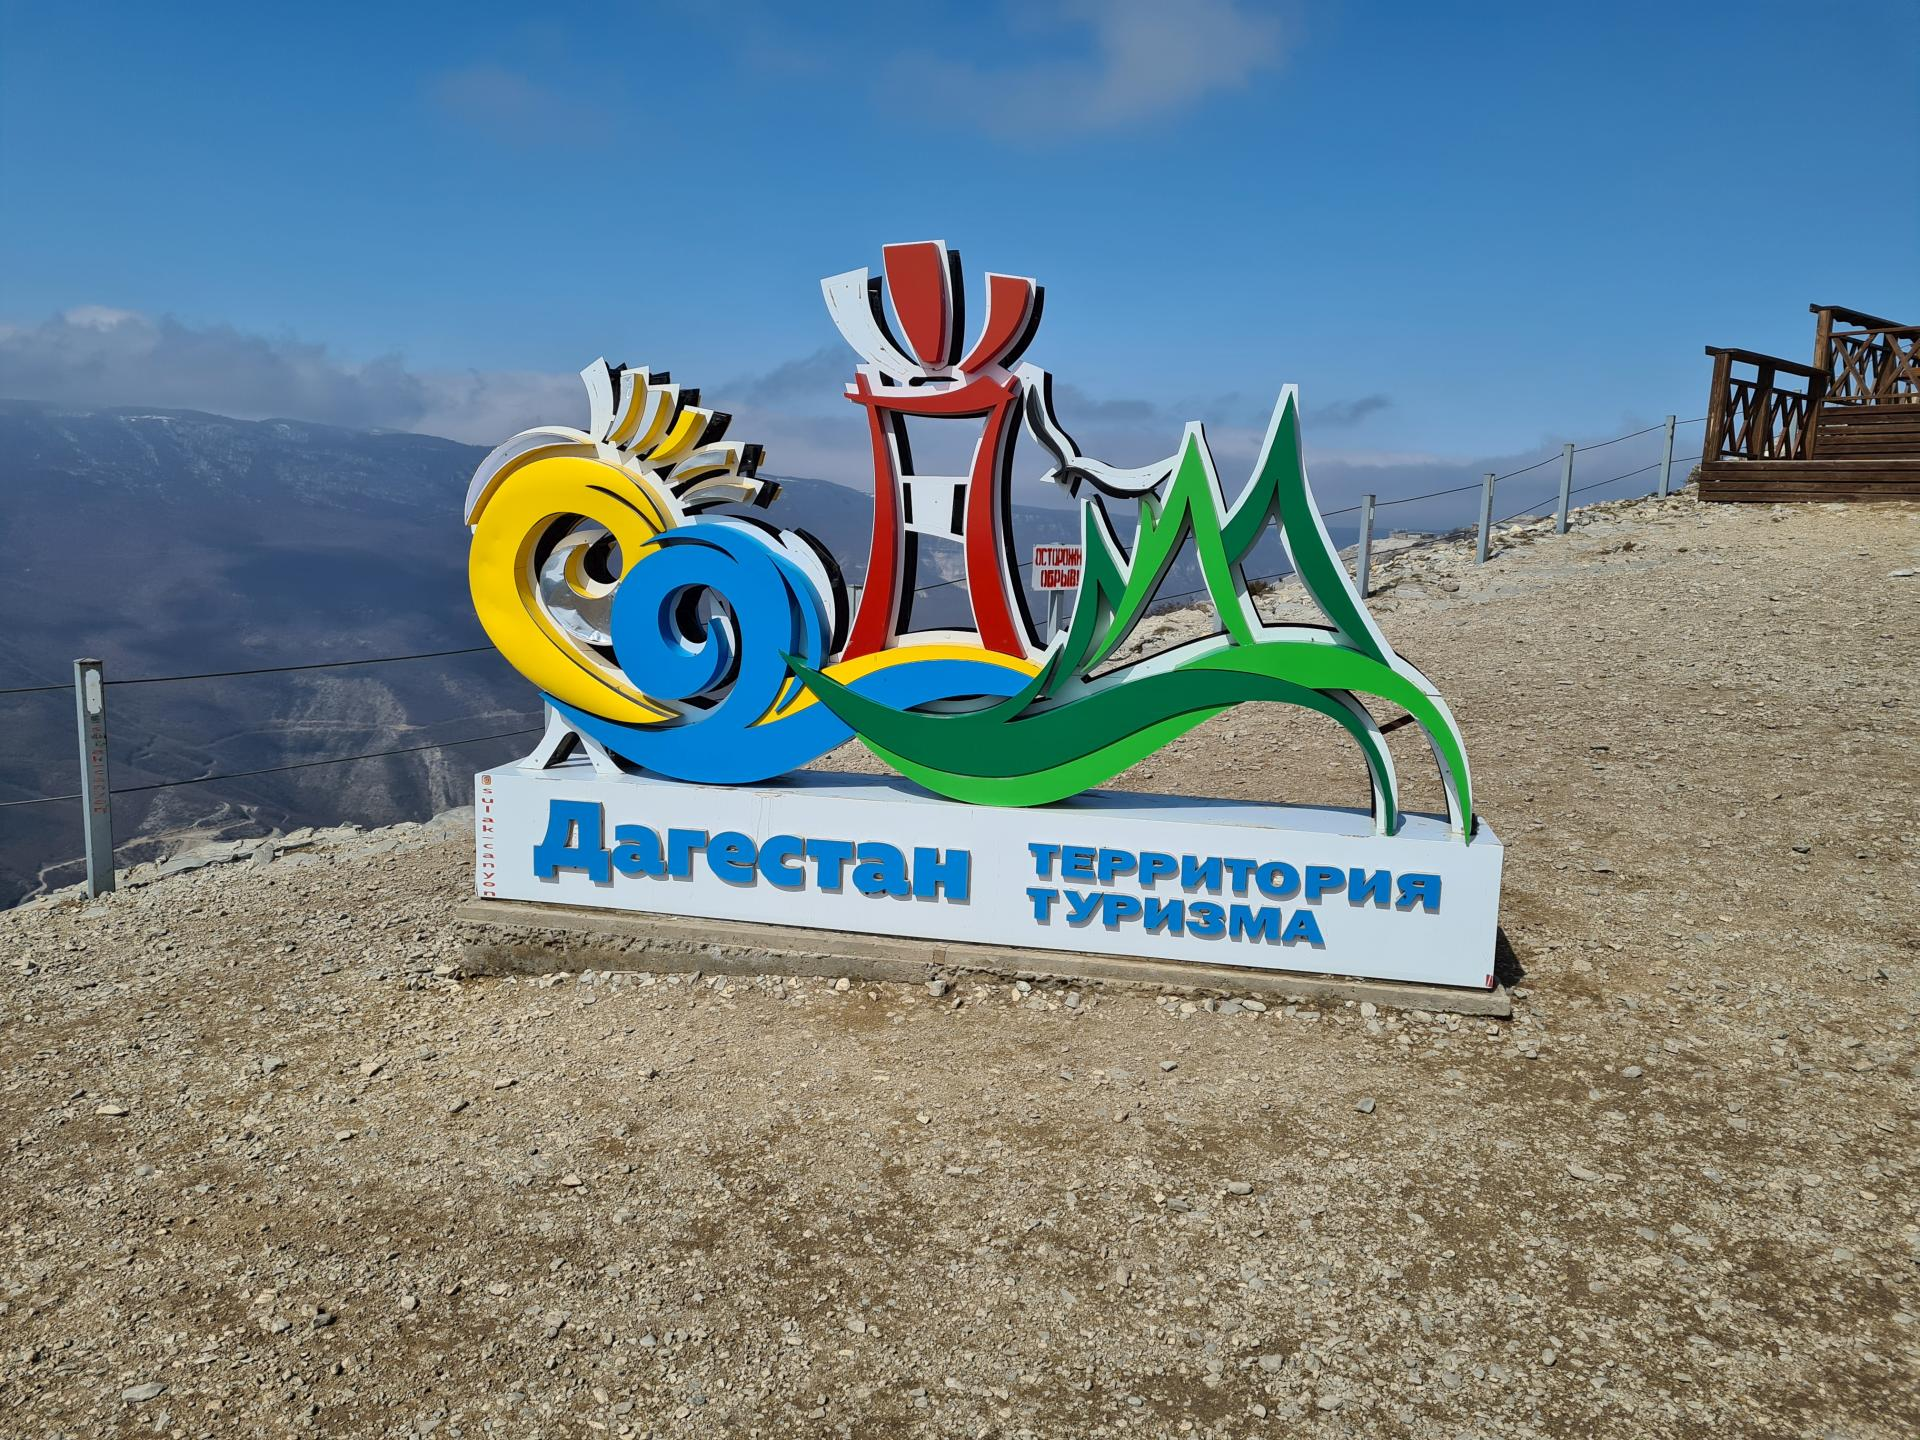 Дагестан территория туризма